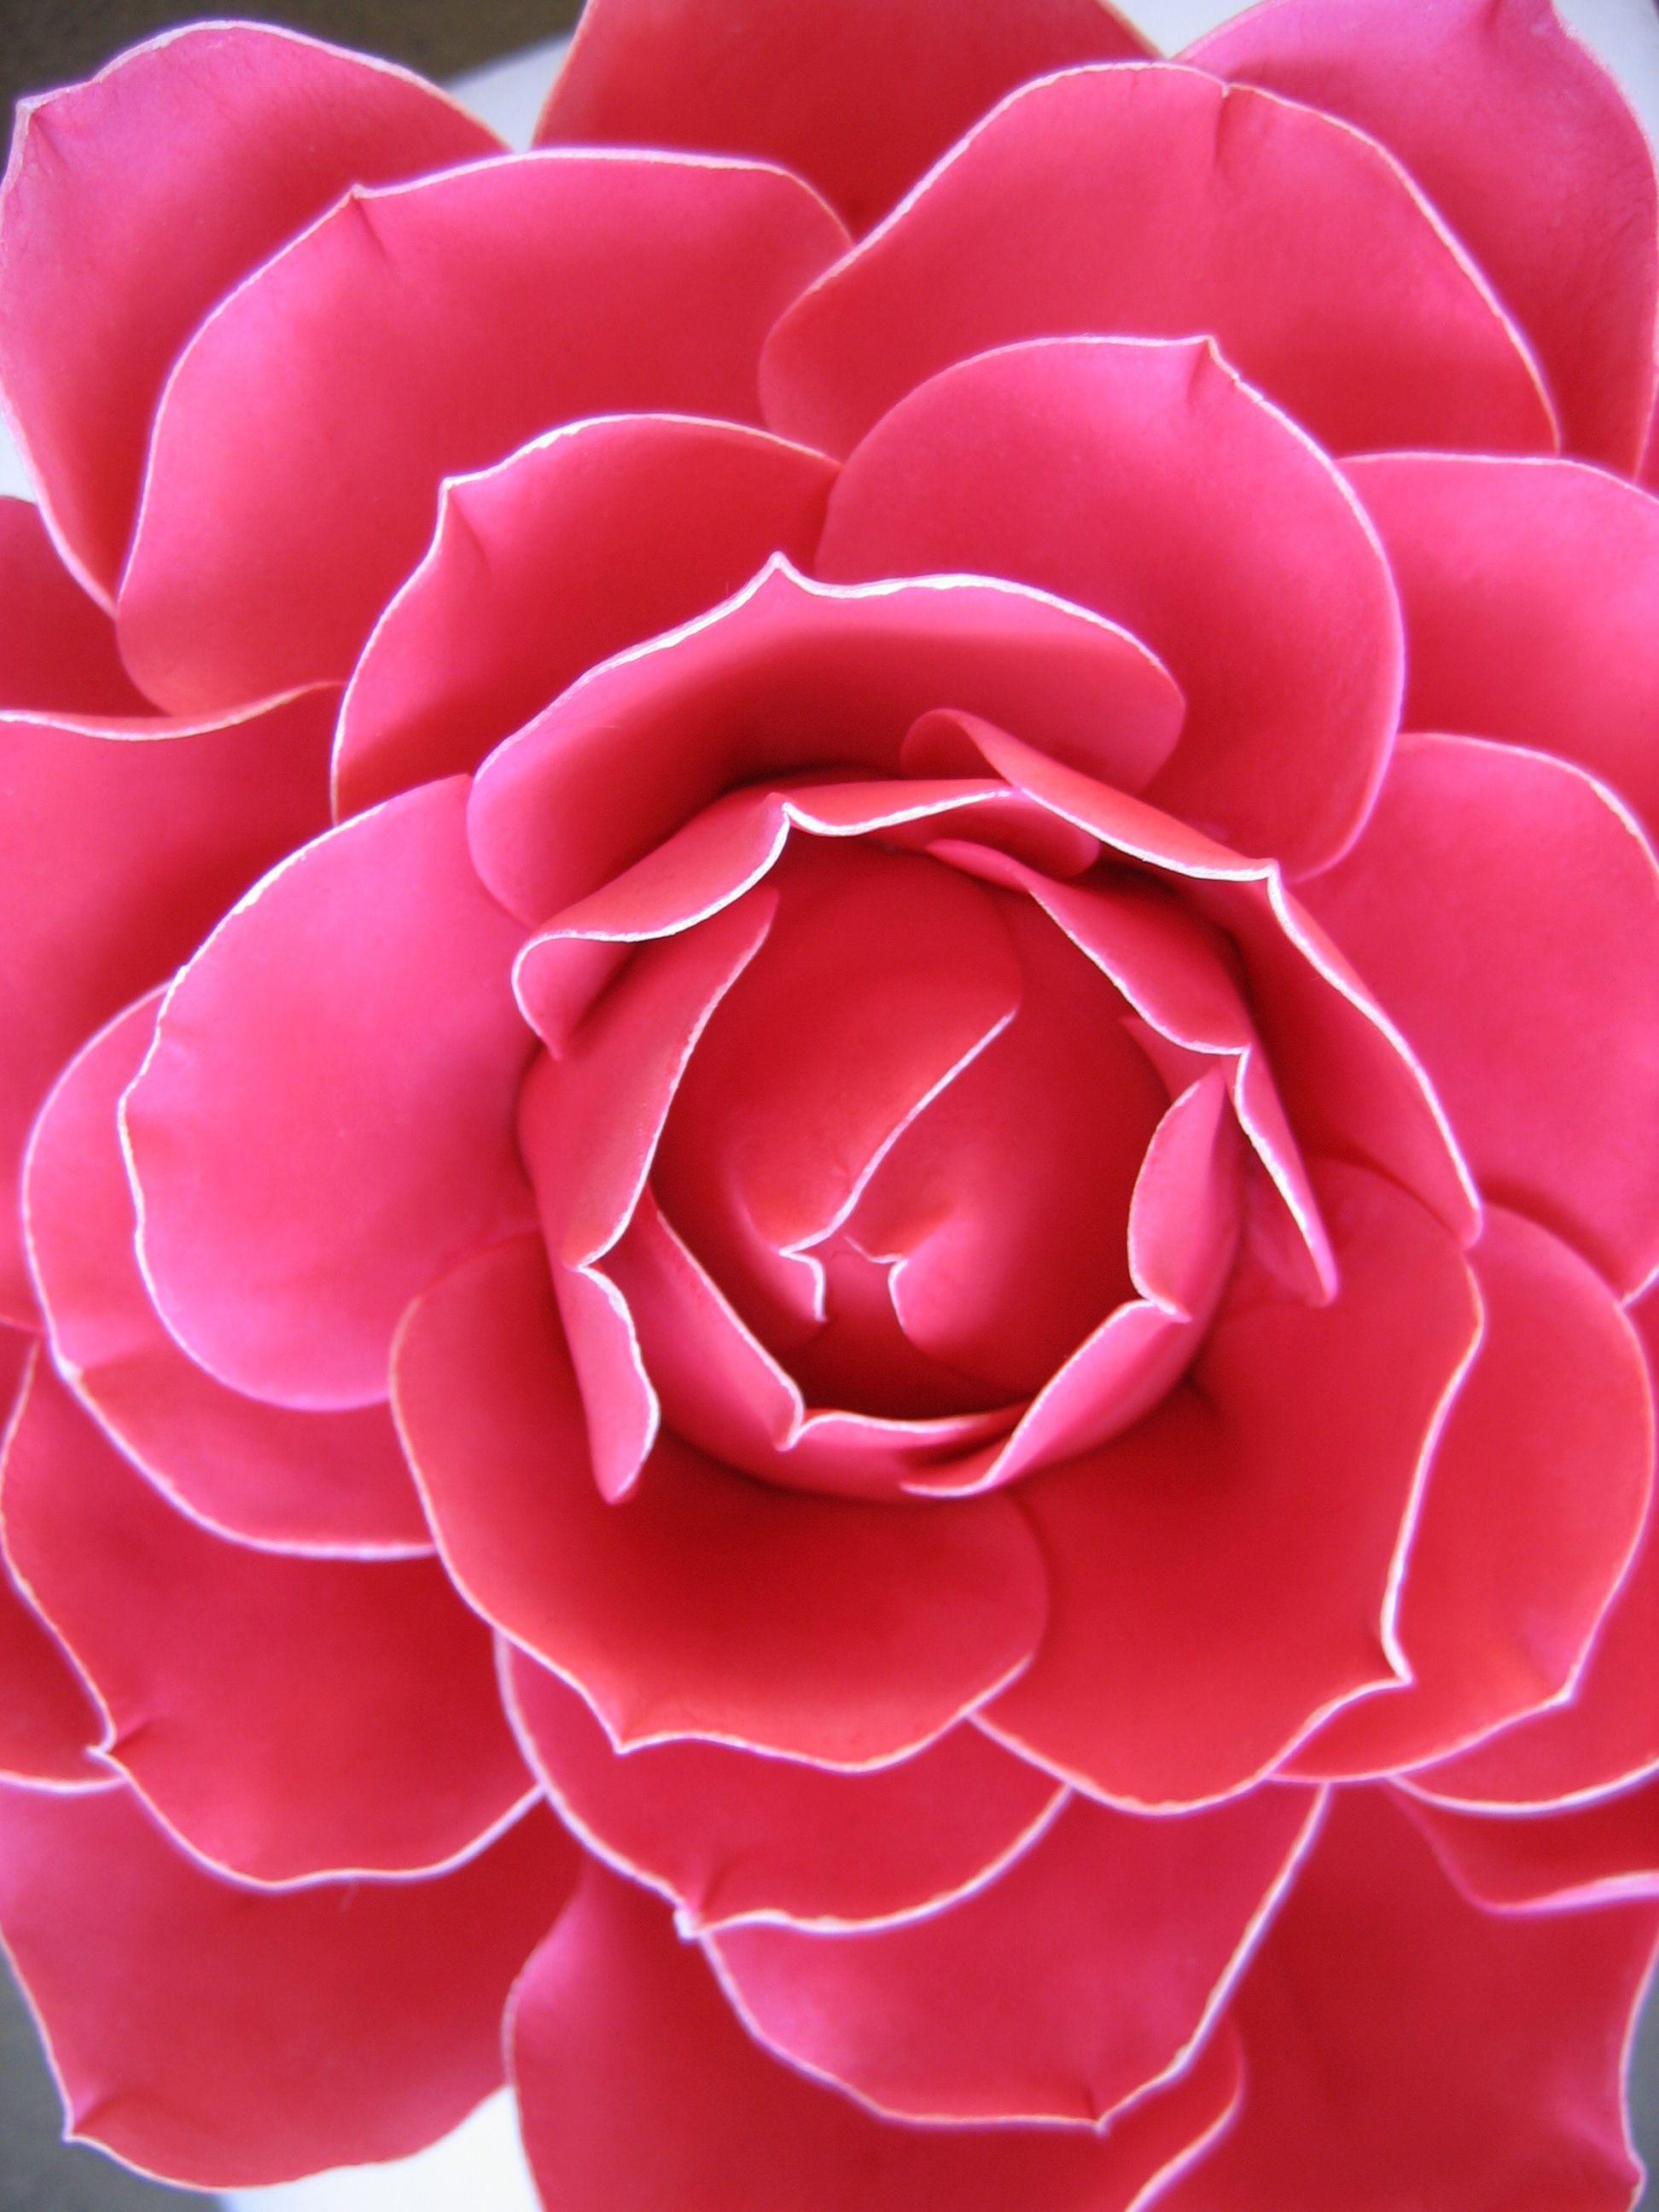 Handmade Gum Paste Camellia By Wendy Kromer Edible Art Rose Tutorial Gum Paste